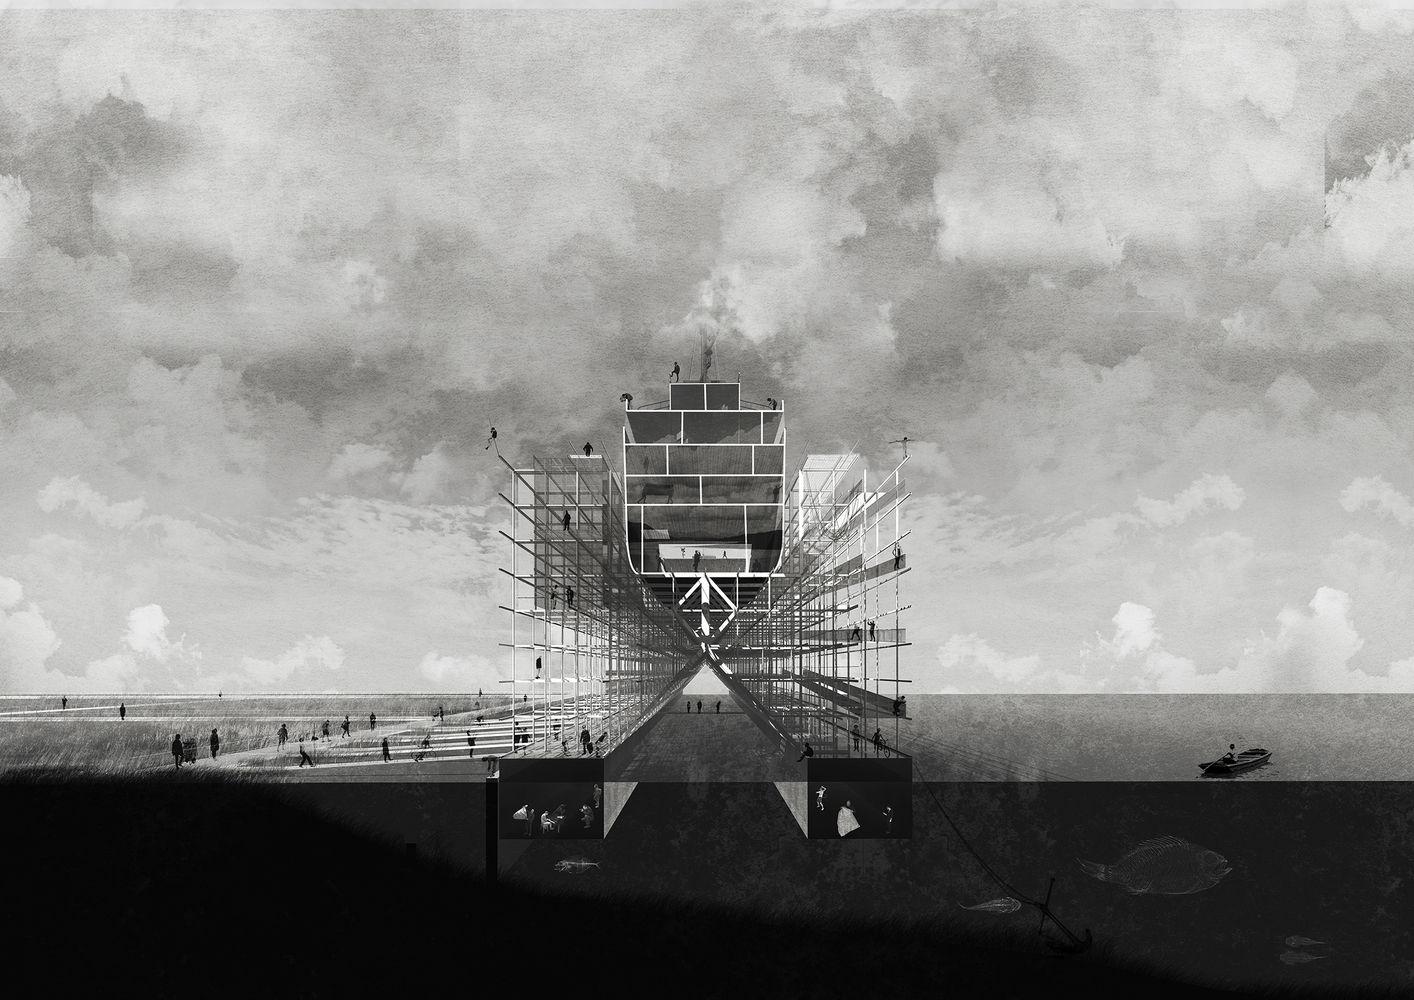 Galer a de museo de la construcci n naval gran ganador for Arquitectura naval e ingenieria maritima